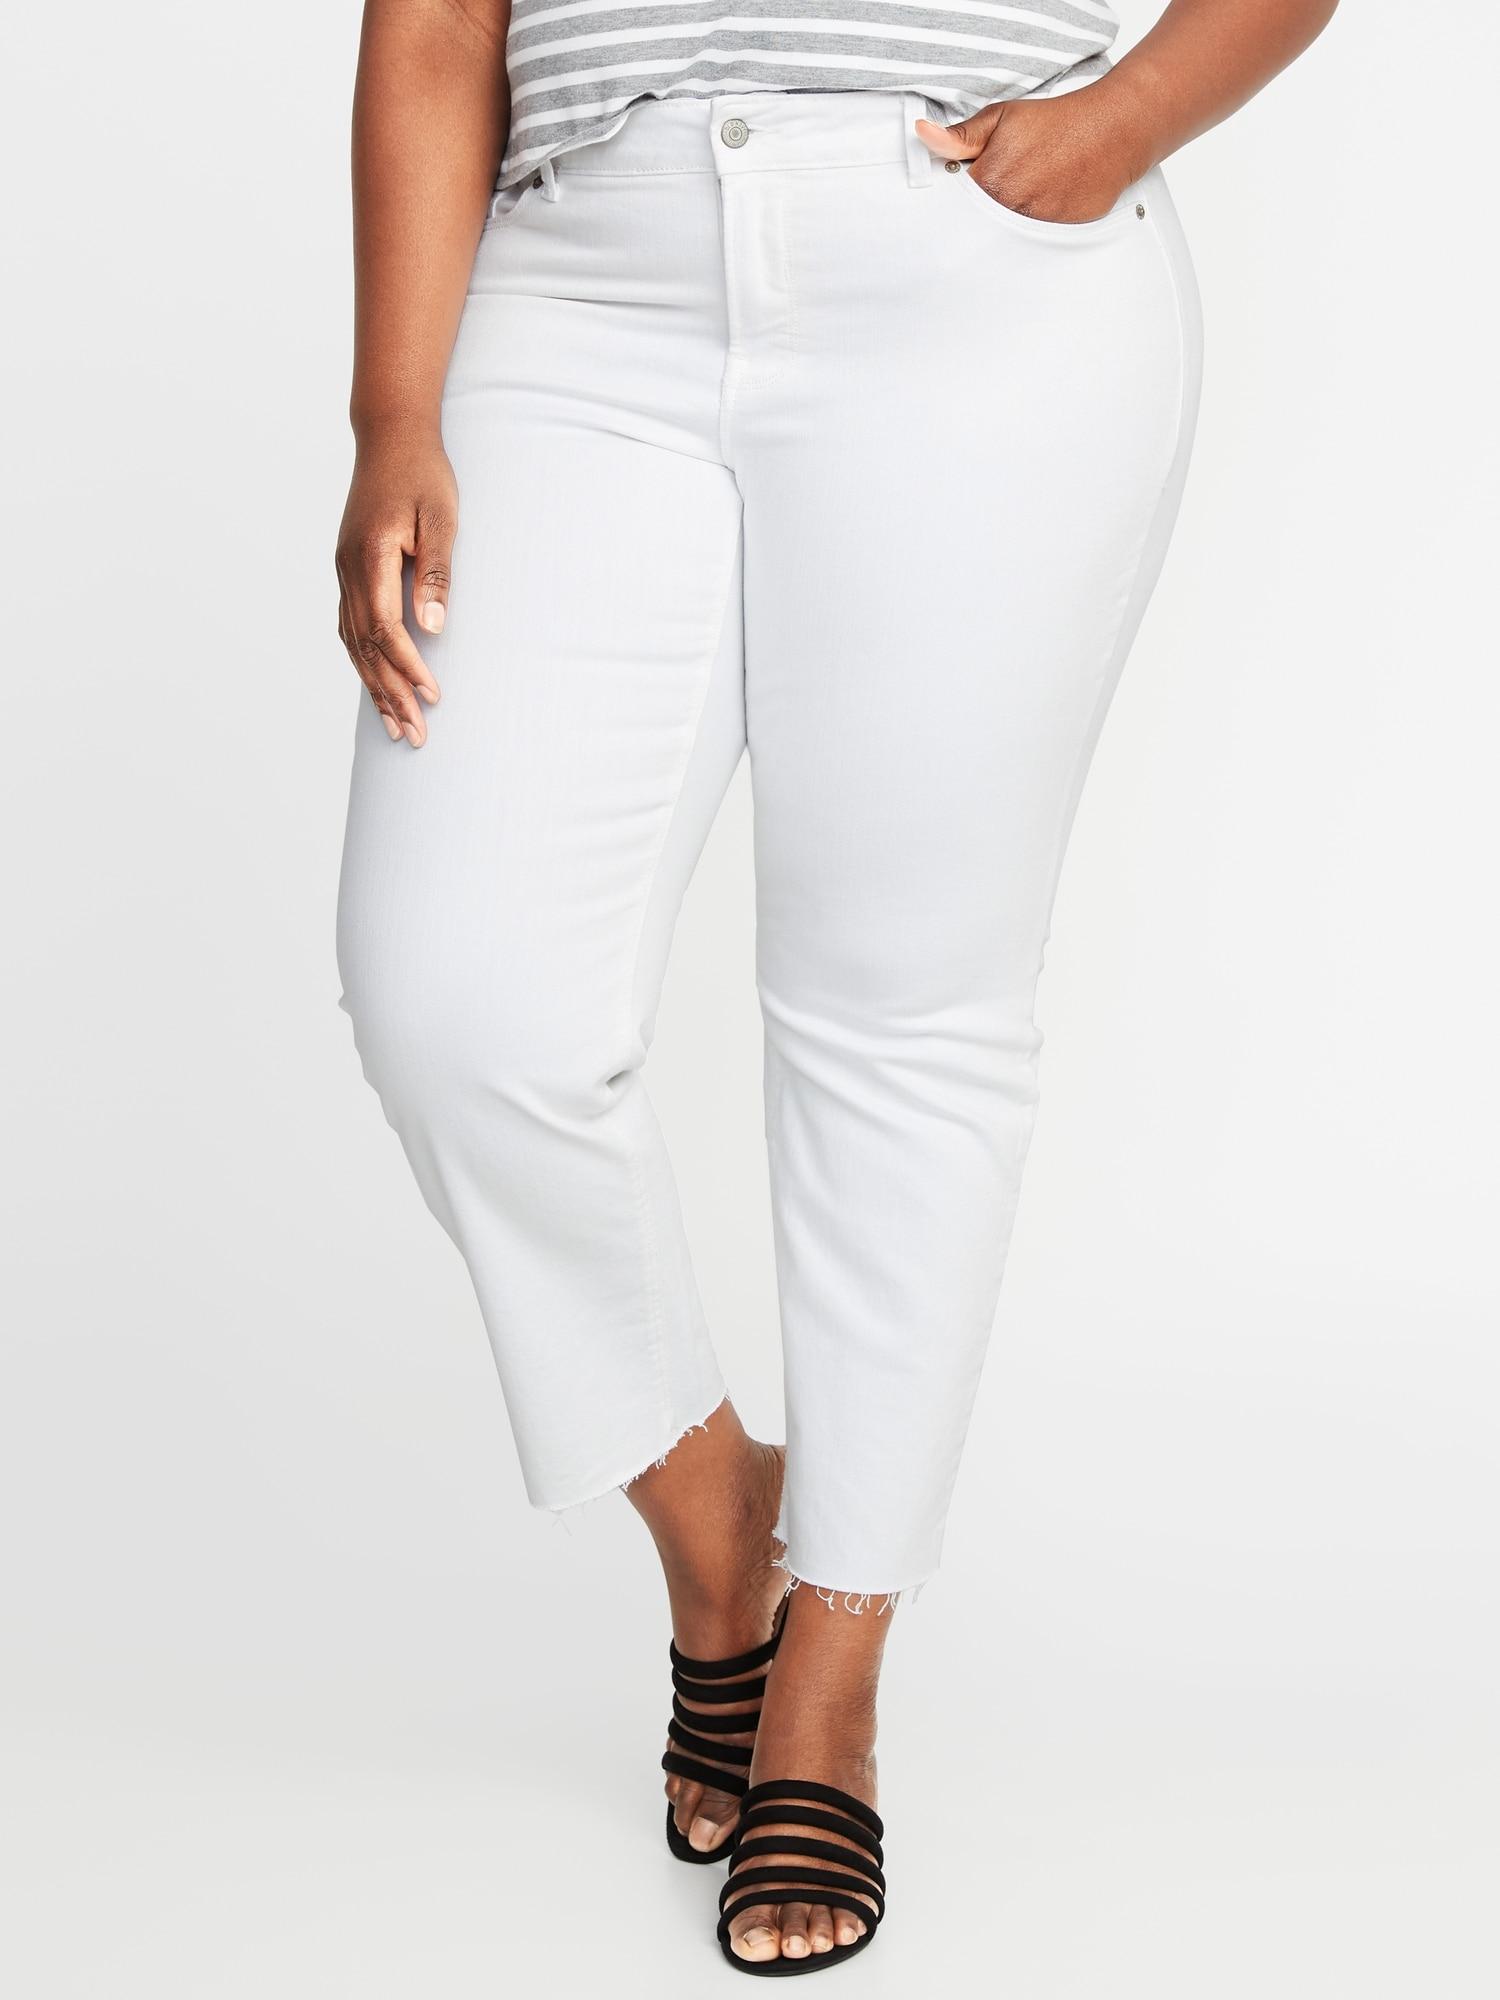 c27ccd2d349 High-Rise Secret-Slim Pockets + Waistband Power Slim Straight Plus-Size  Jeans